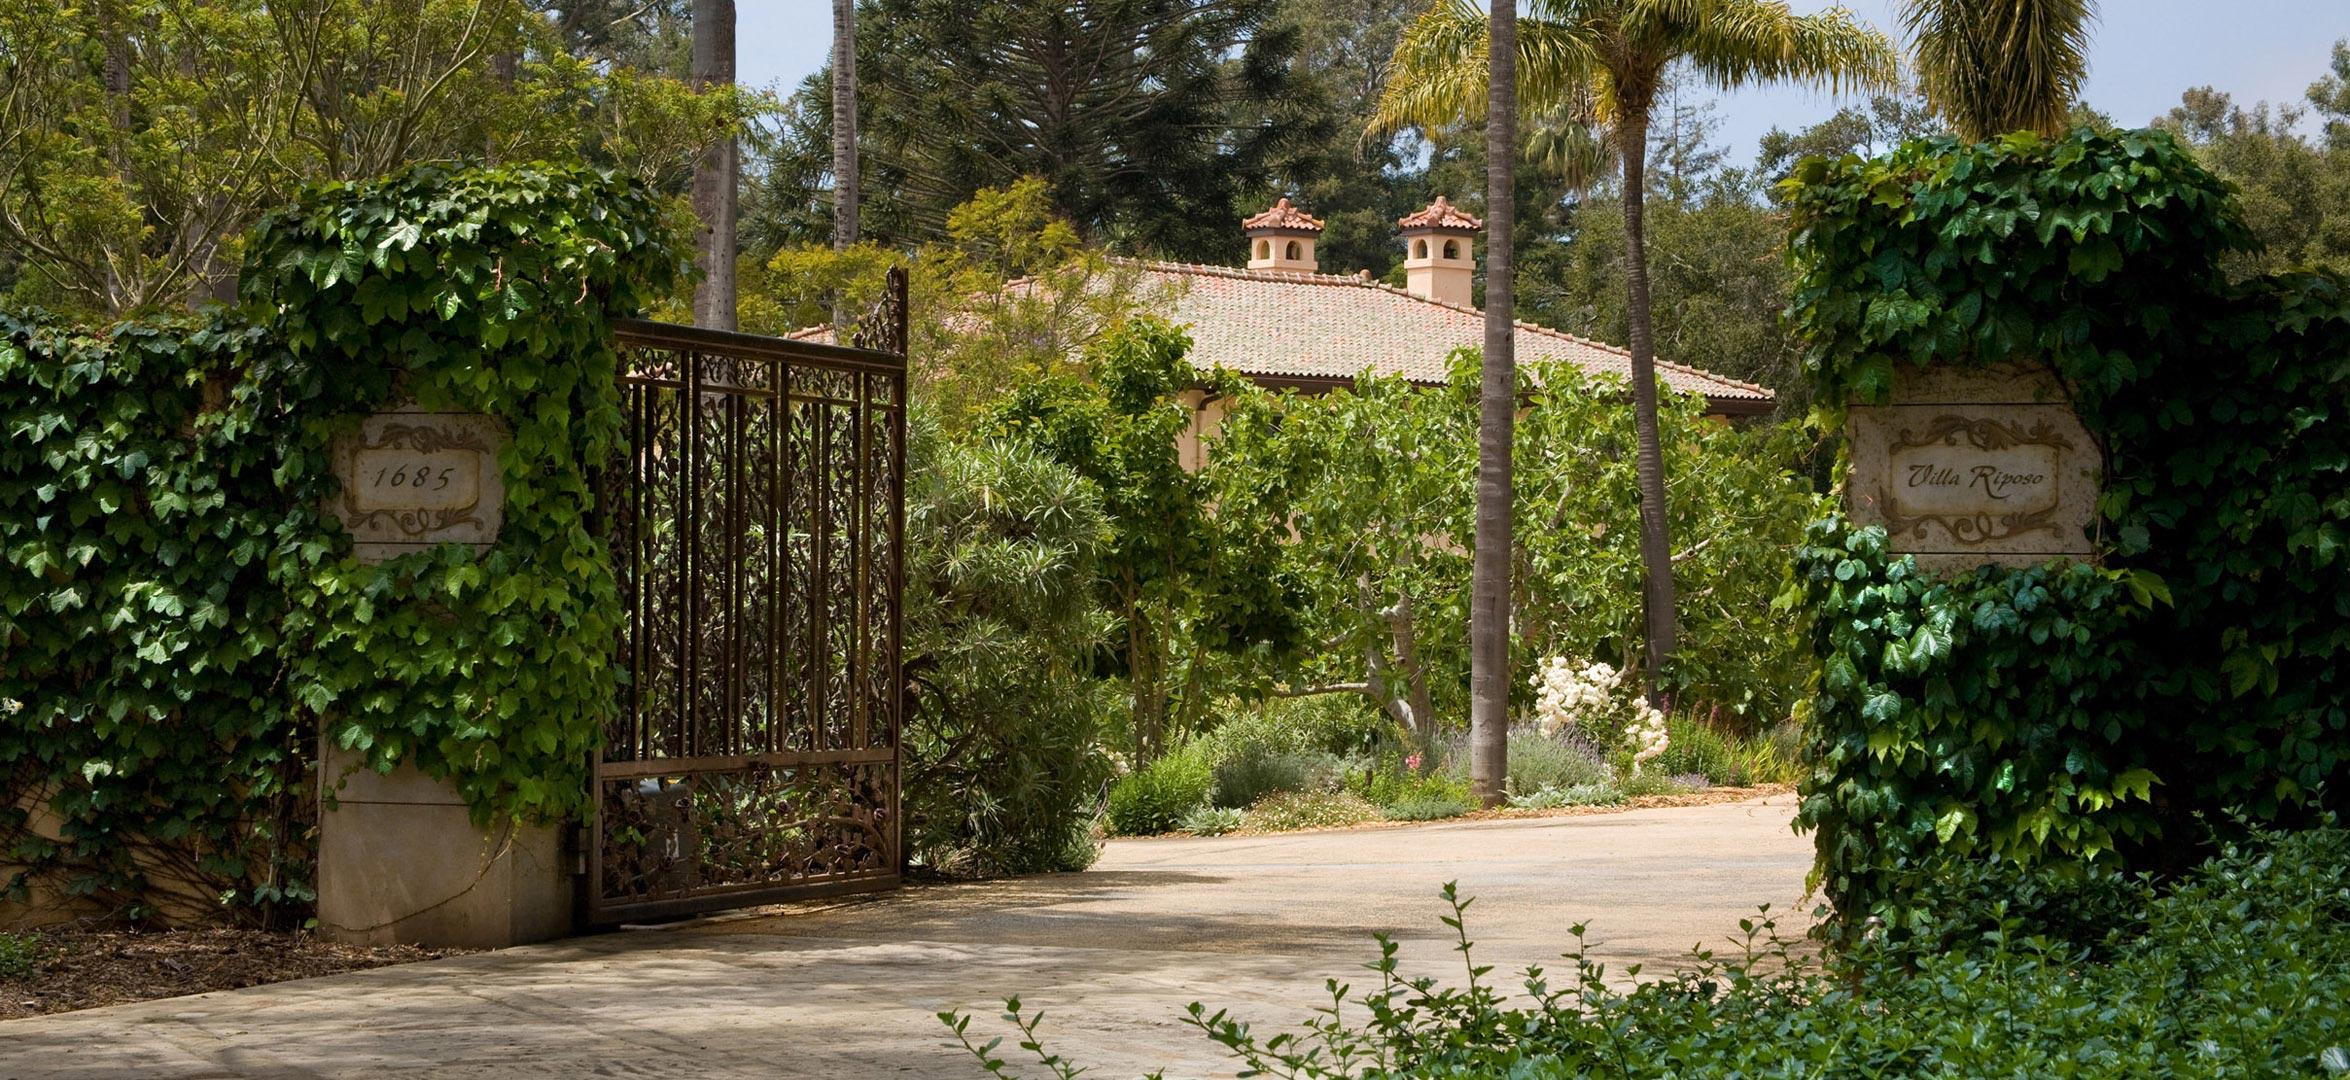 Montecito-02-steel-gate.jpg